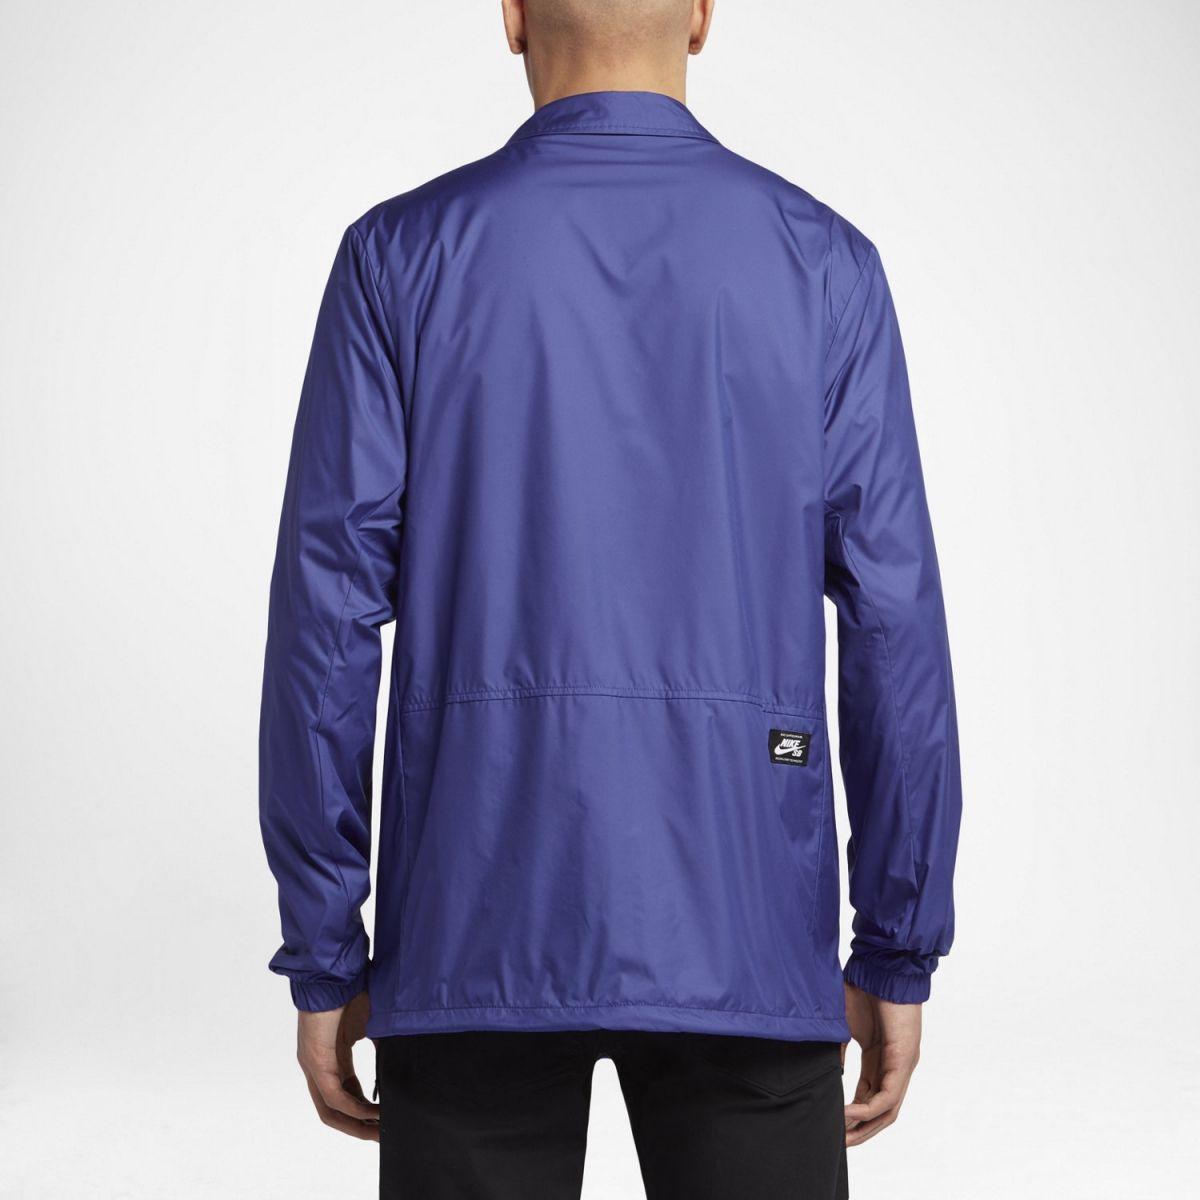 1ee89bdfb33b Type Jackets Nike SB Shield Coaches Jacket